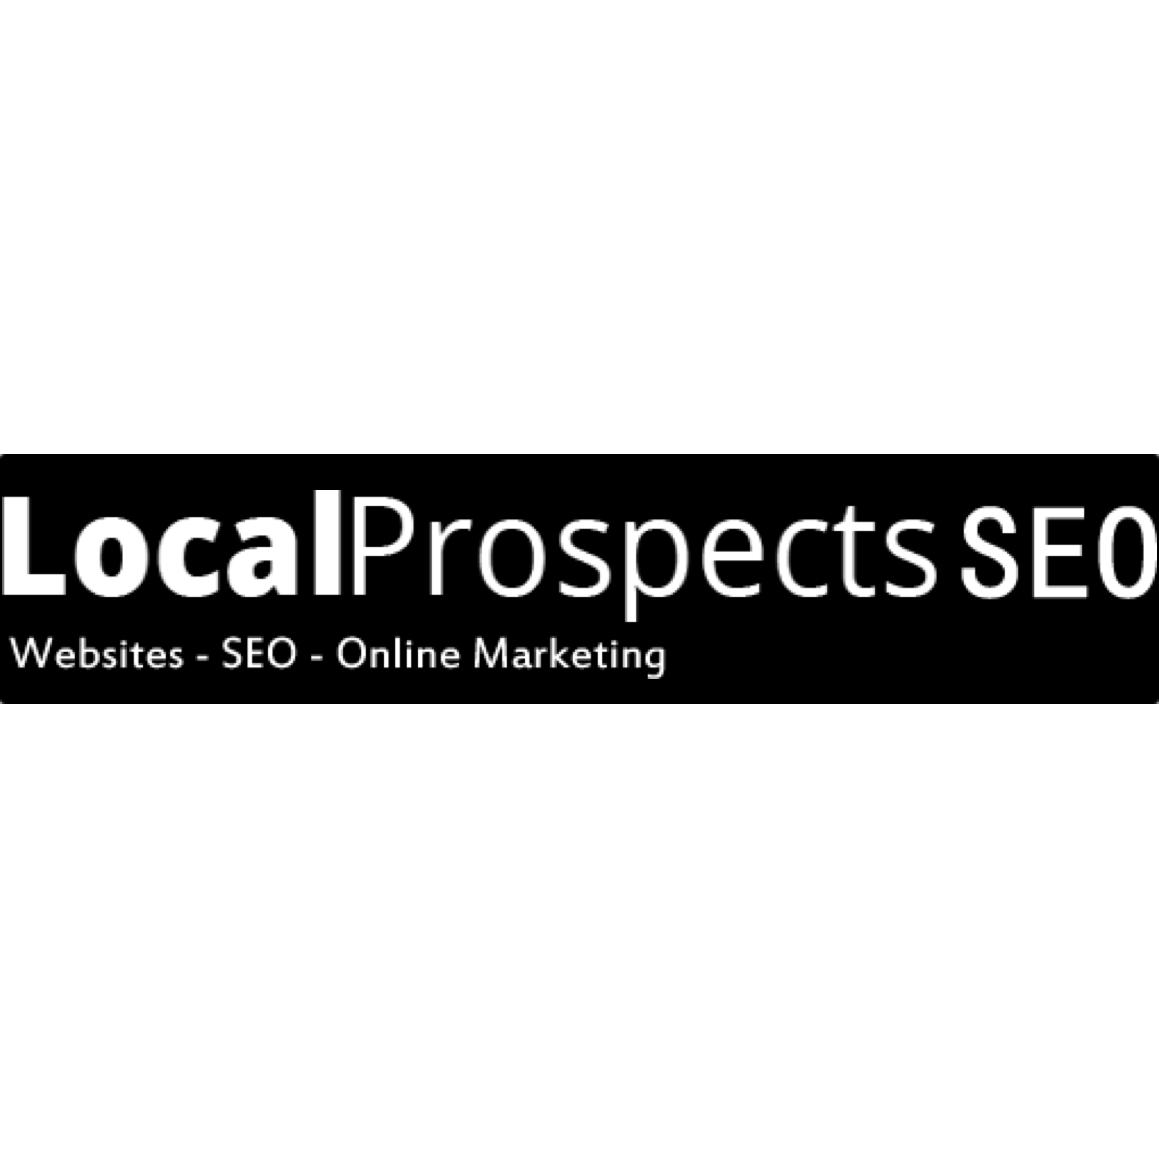 Local Prospects SEO